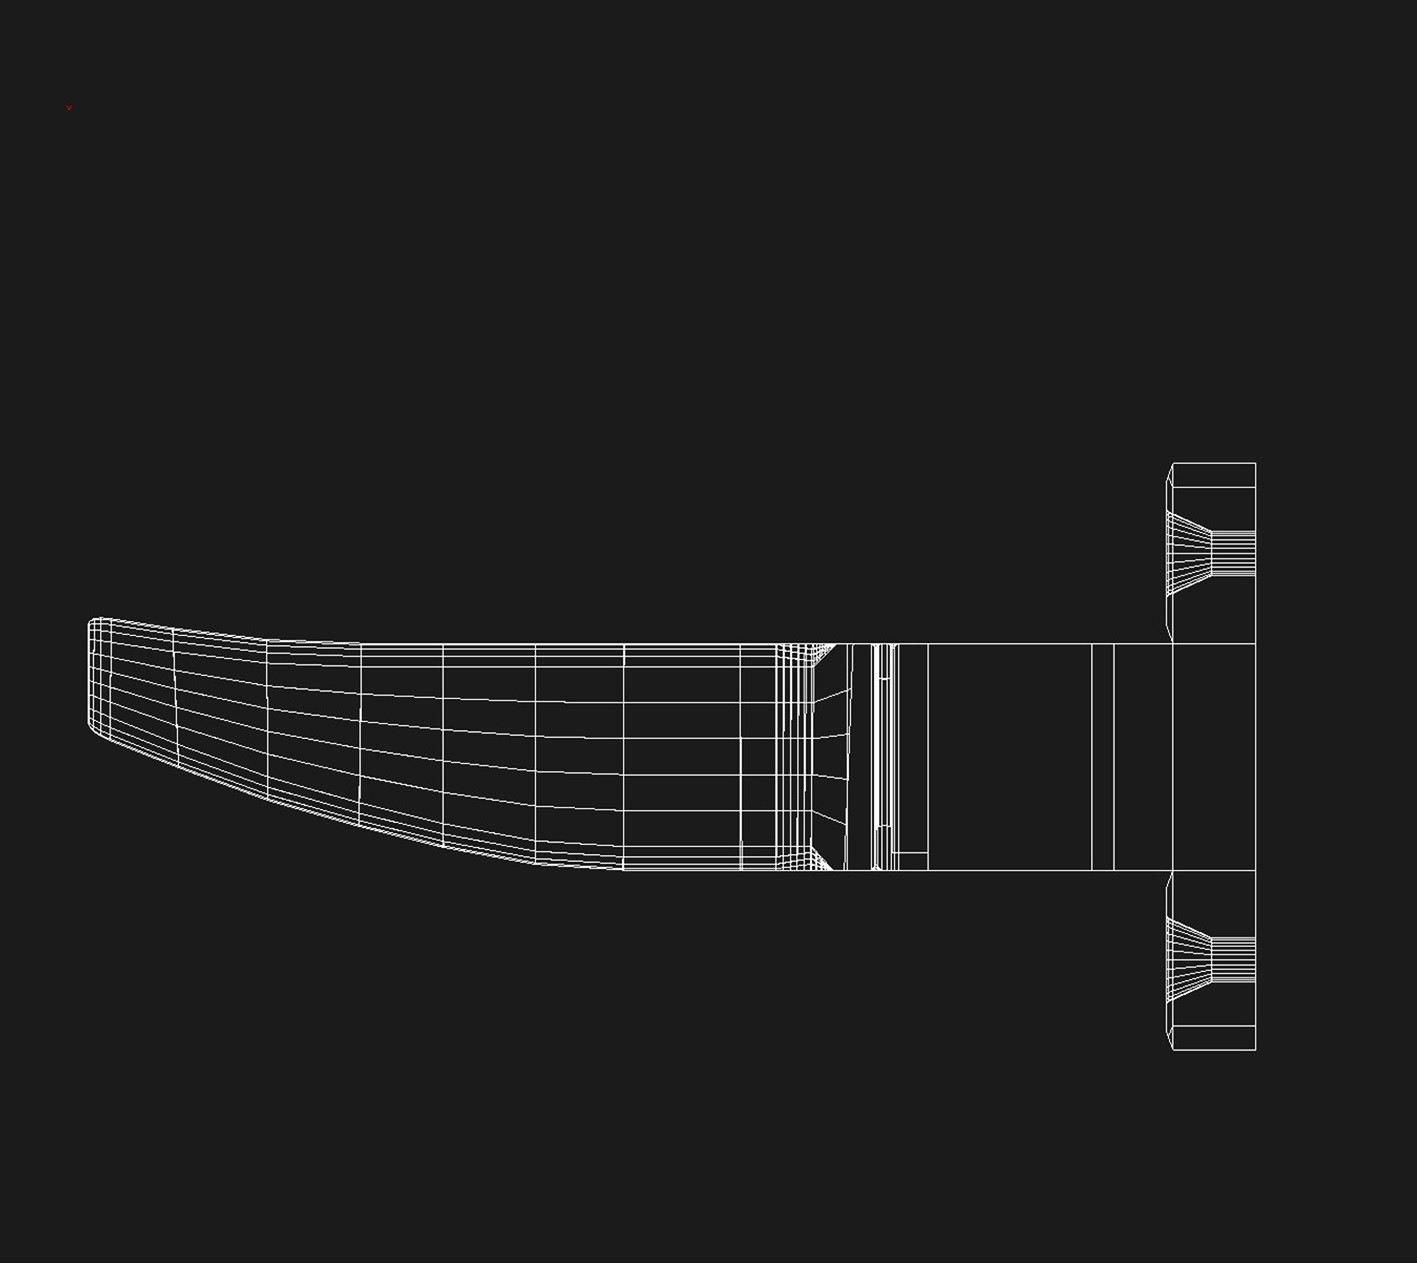 colgador_vistas_right.jpg Download free STL file Guitar hanger with puero • Model to 3D print, danielhuertasperez